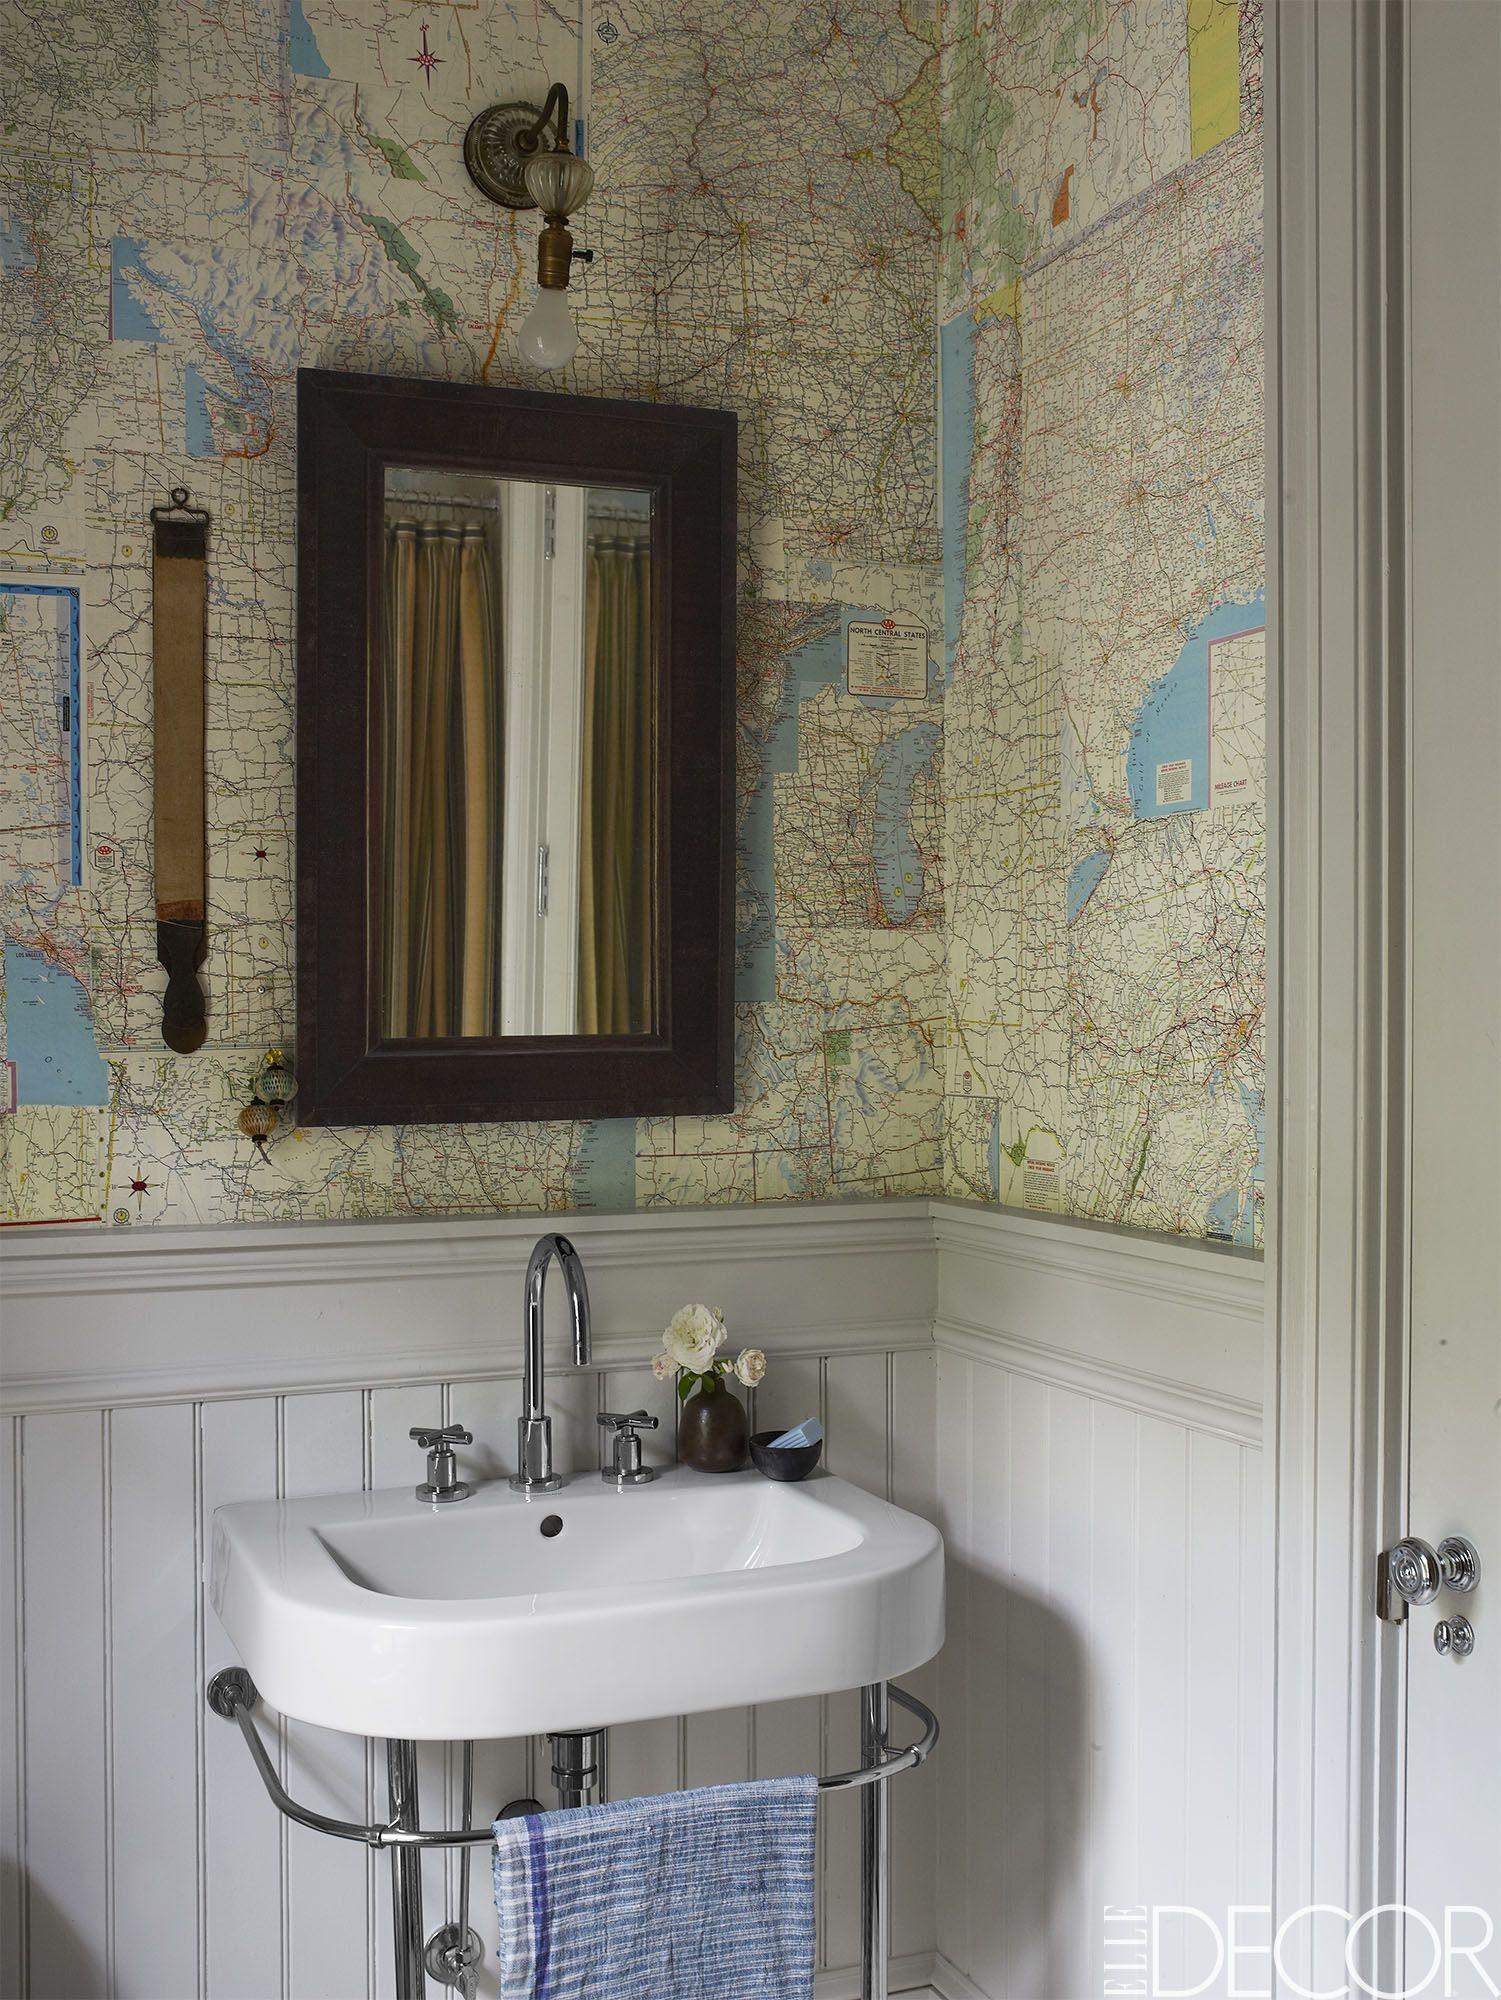 Design Small Bathroom Cute Best Small Bathroom Ideas Small Bathroom Ideas and Designs Concept